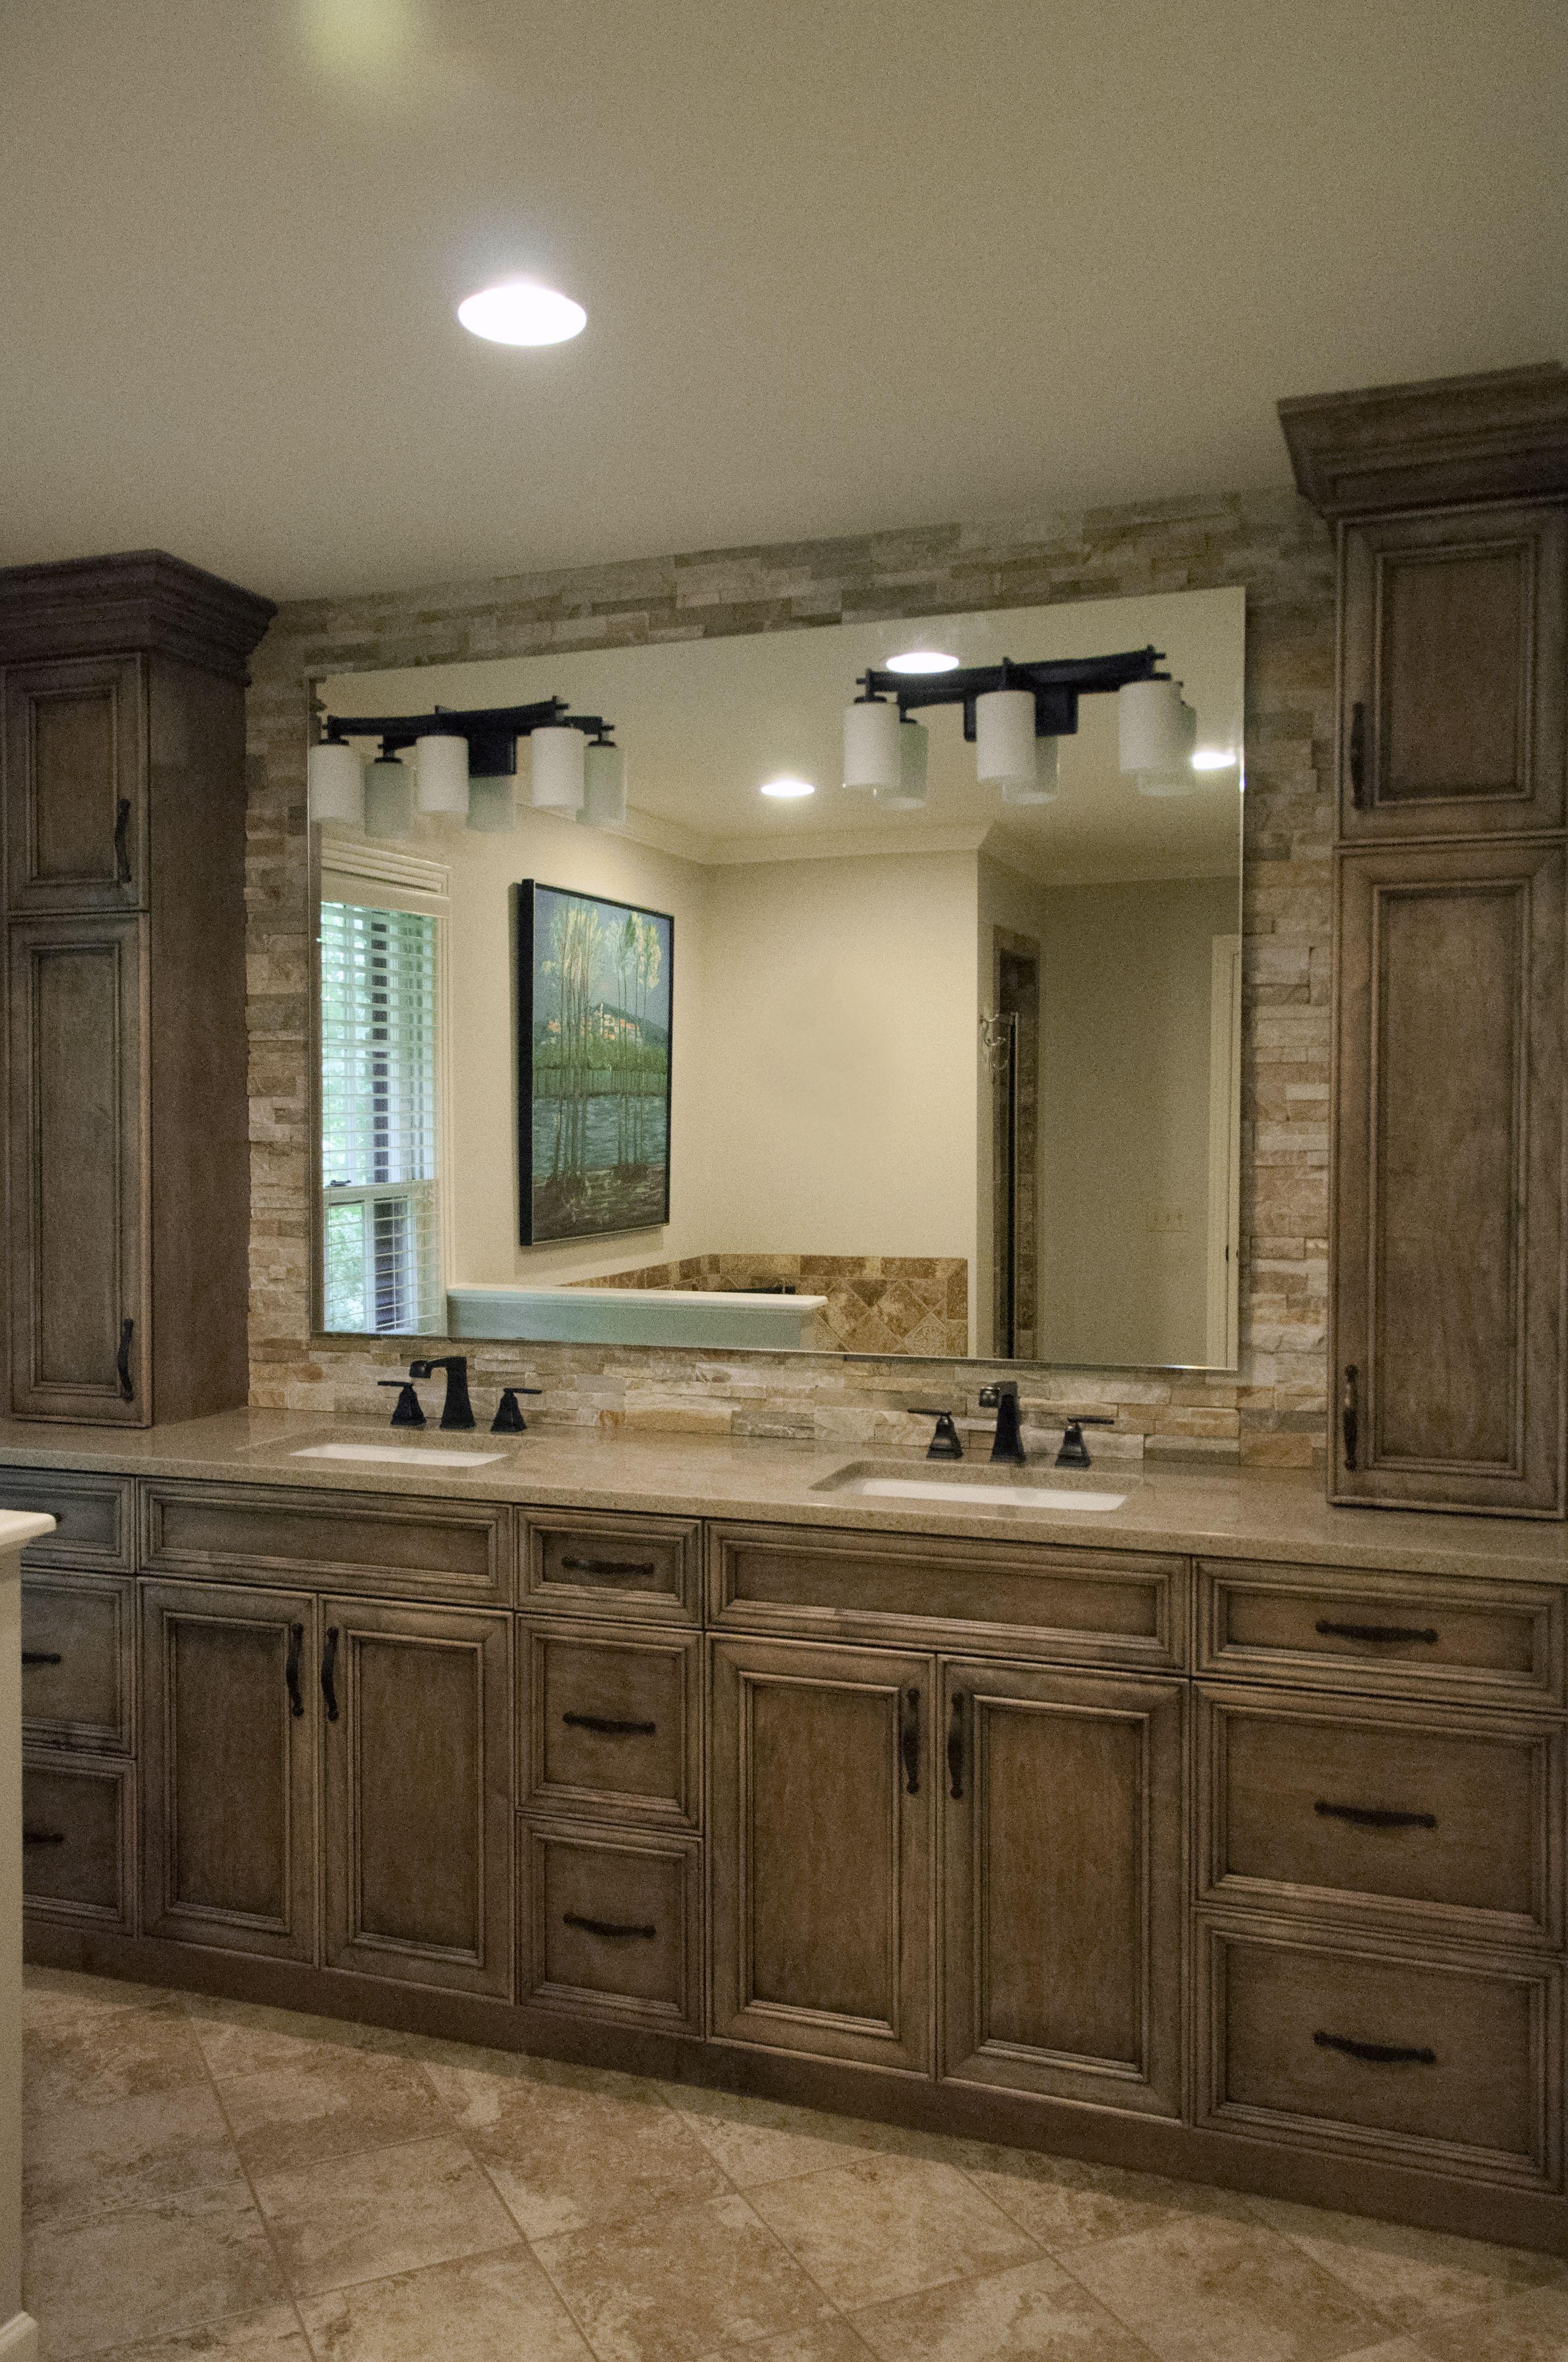 Rustic Master Bath | Kitchen/Bath Designer Terri Sears | Eudora Cabinetry |  Raised Mirror